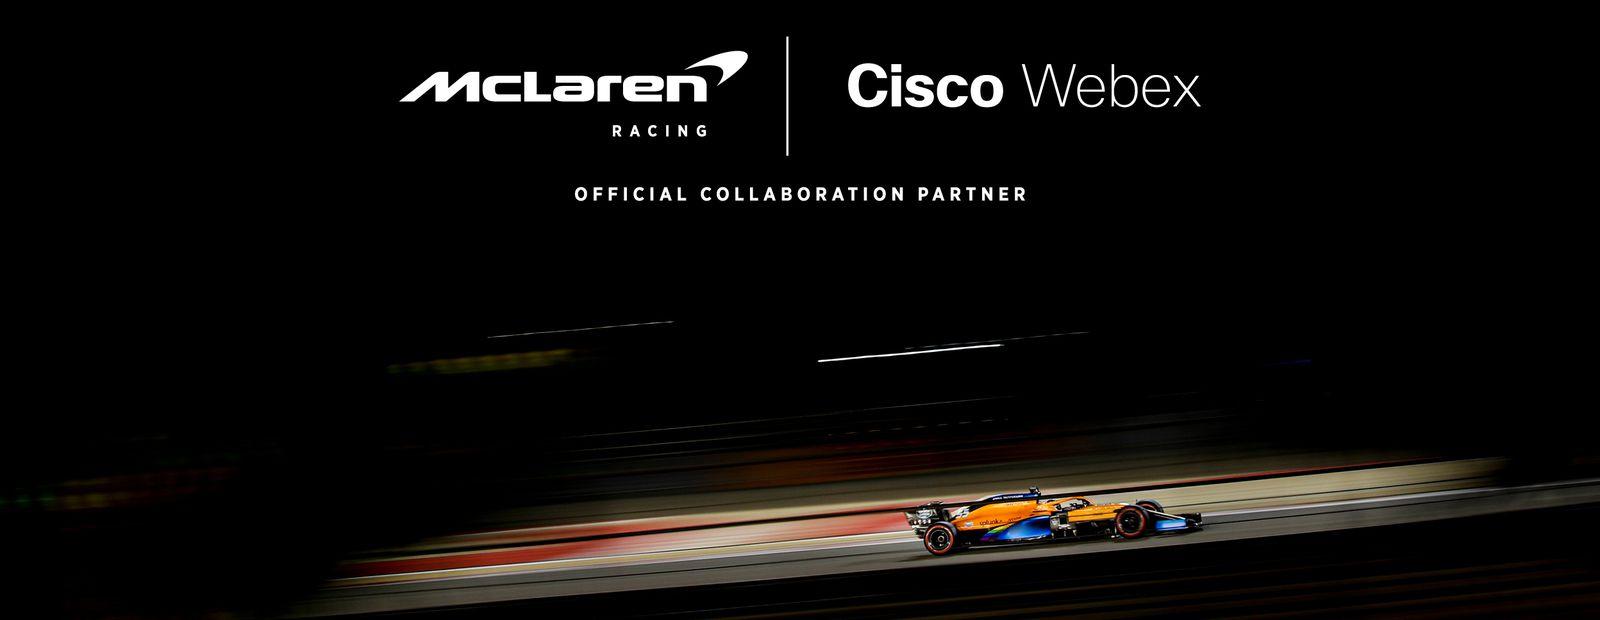 Cisco Webex è Official Collaboration Partner del team McLaren di Formula 1